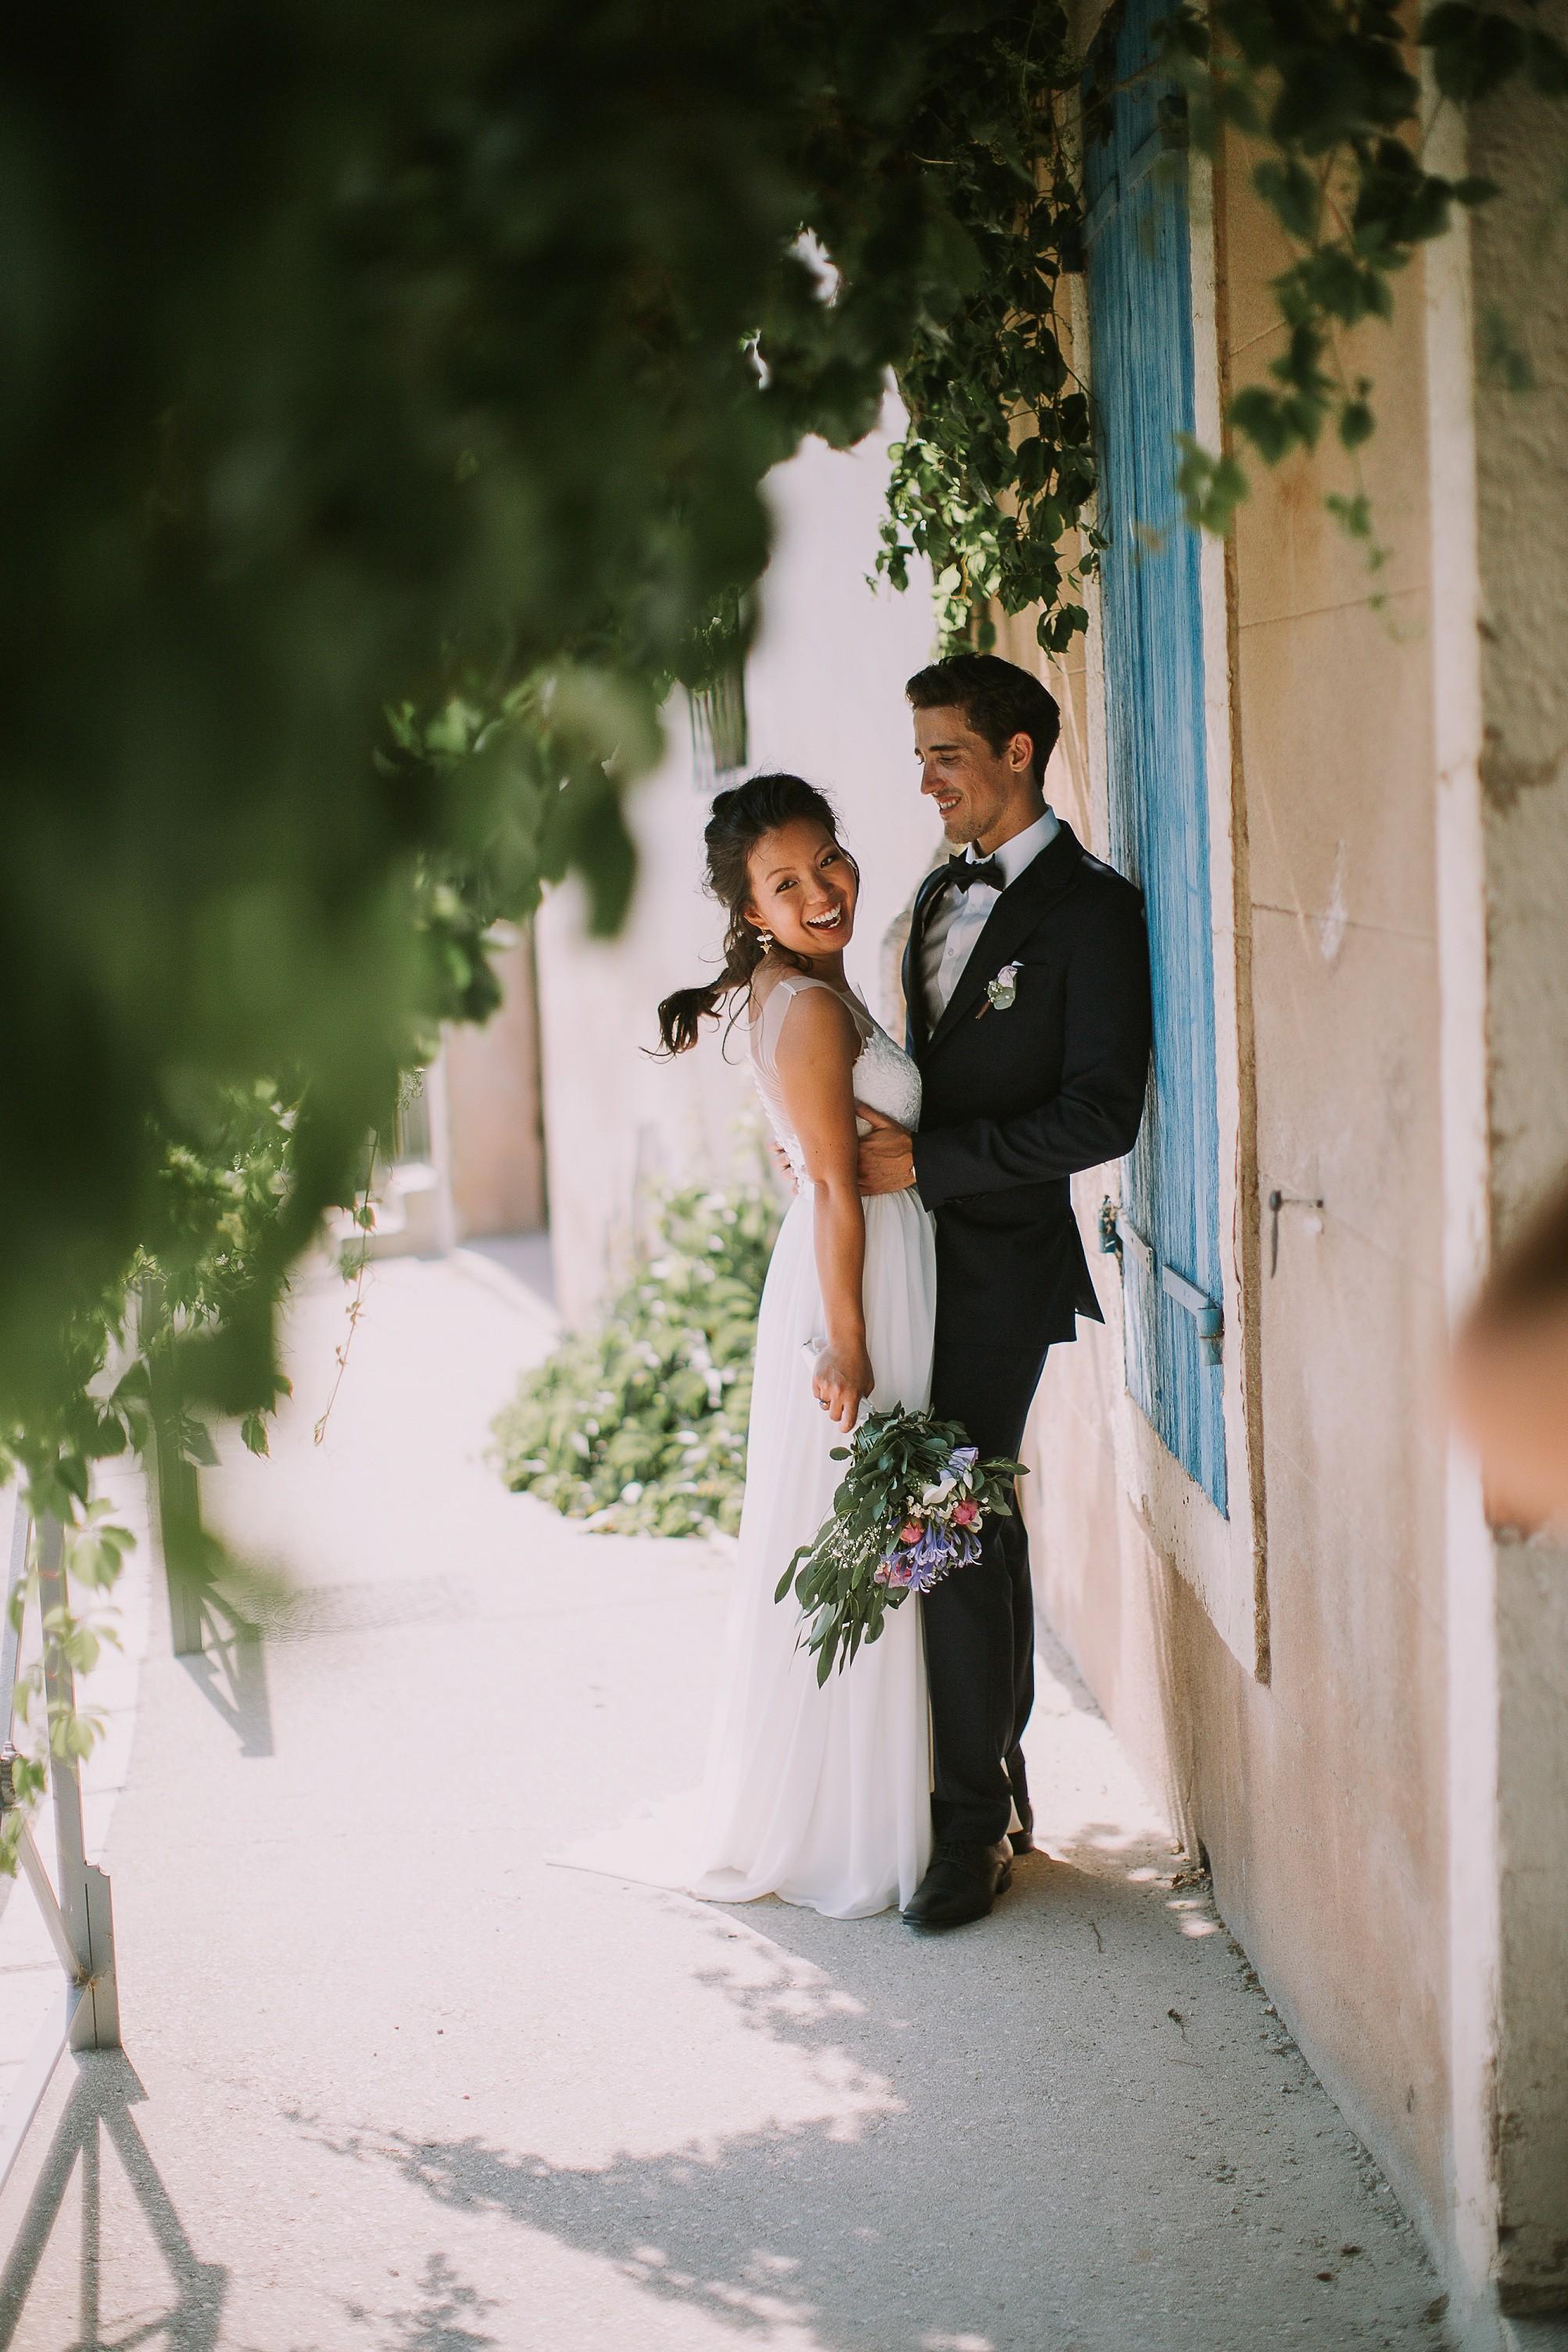 katerynaphotos-mariage-photographe-puyloubier-provence-aix-en-provence-sud-de-la-france_0376.jpg